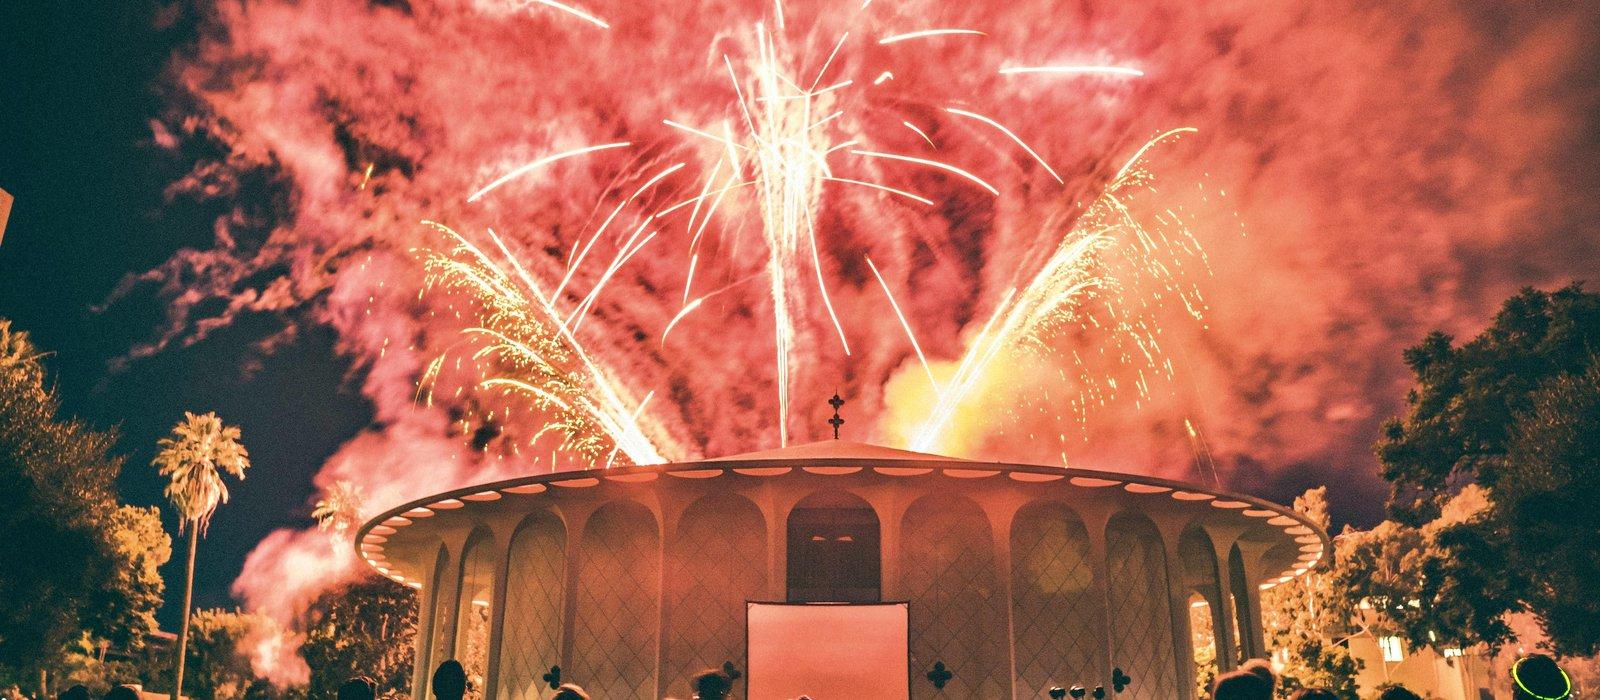 Fireworks above Beckman Auditorium